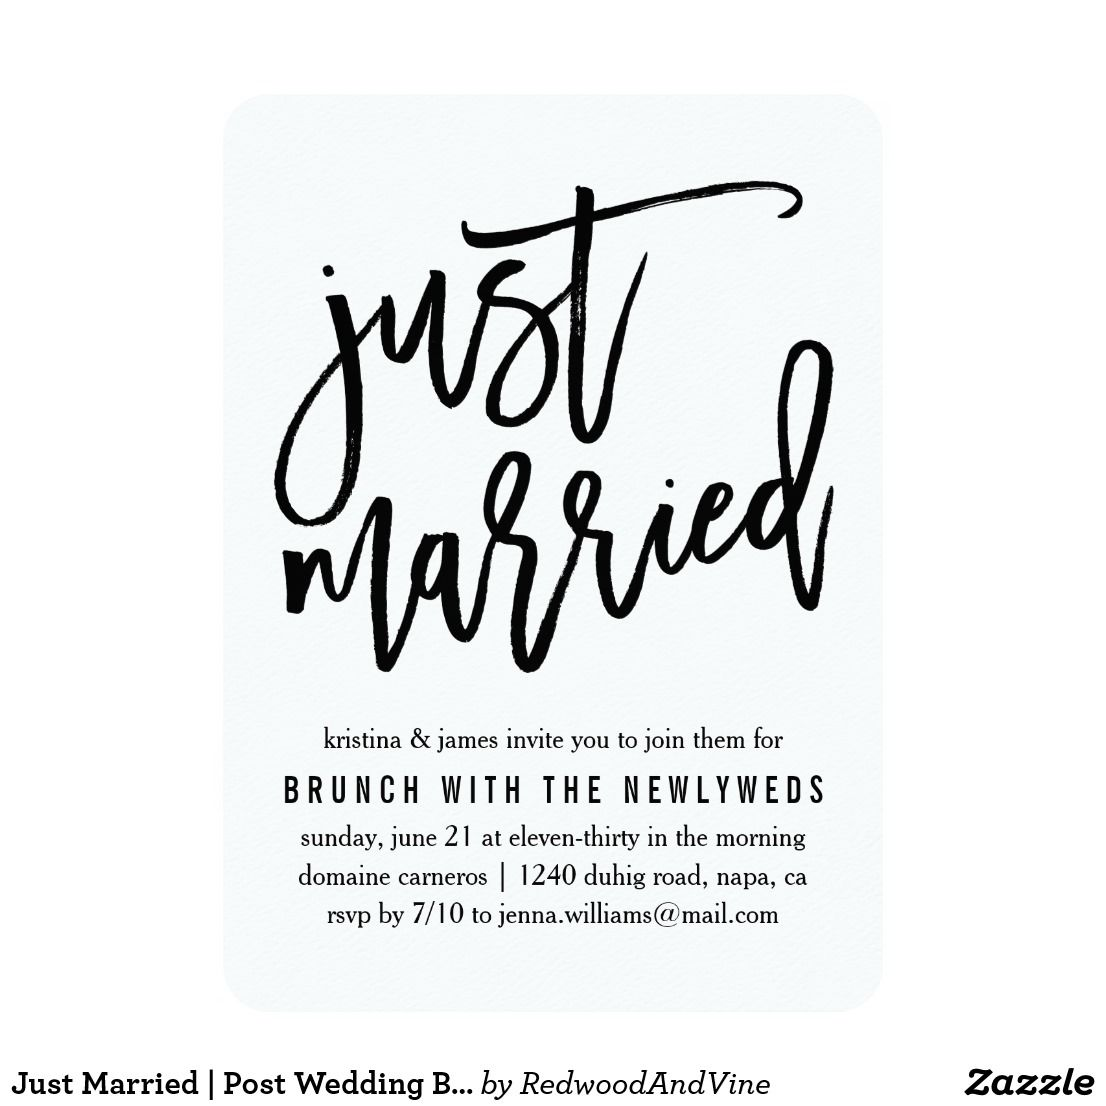 Just Married Post Wedding Brunch Invitation Zazzle Com Wedding Brunch Invitations Post Wedding Brunch Invitations Post Wedding